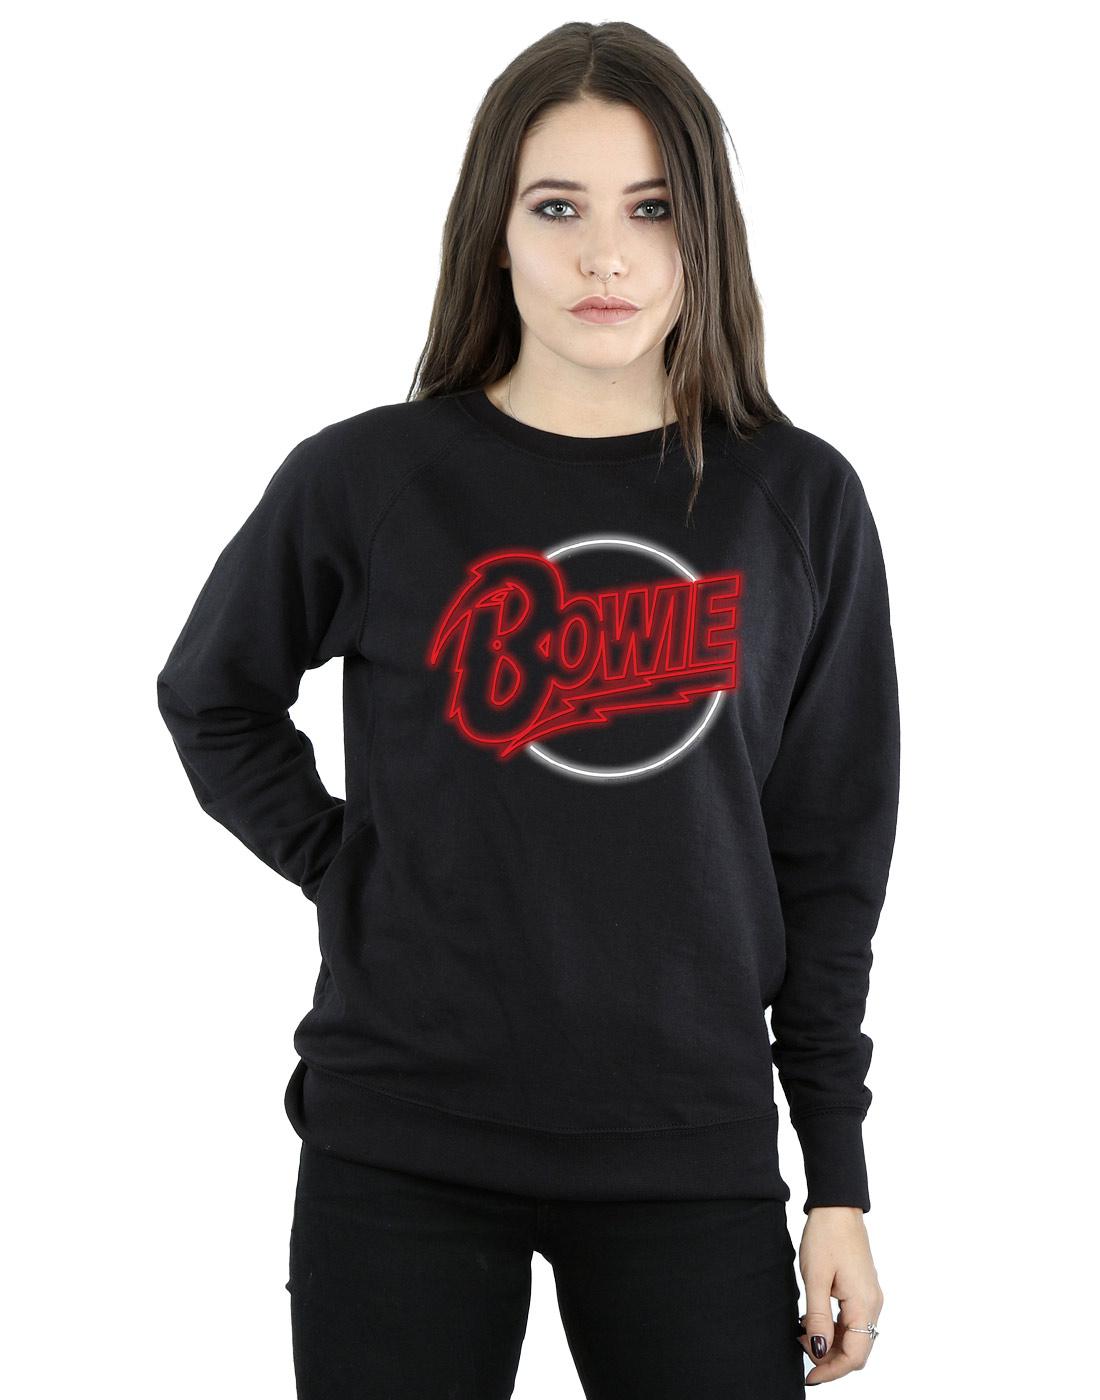 David Bowie Women's Neon Logo Sweatshirt